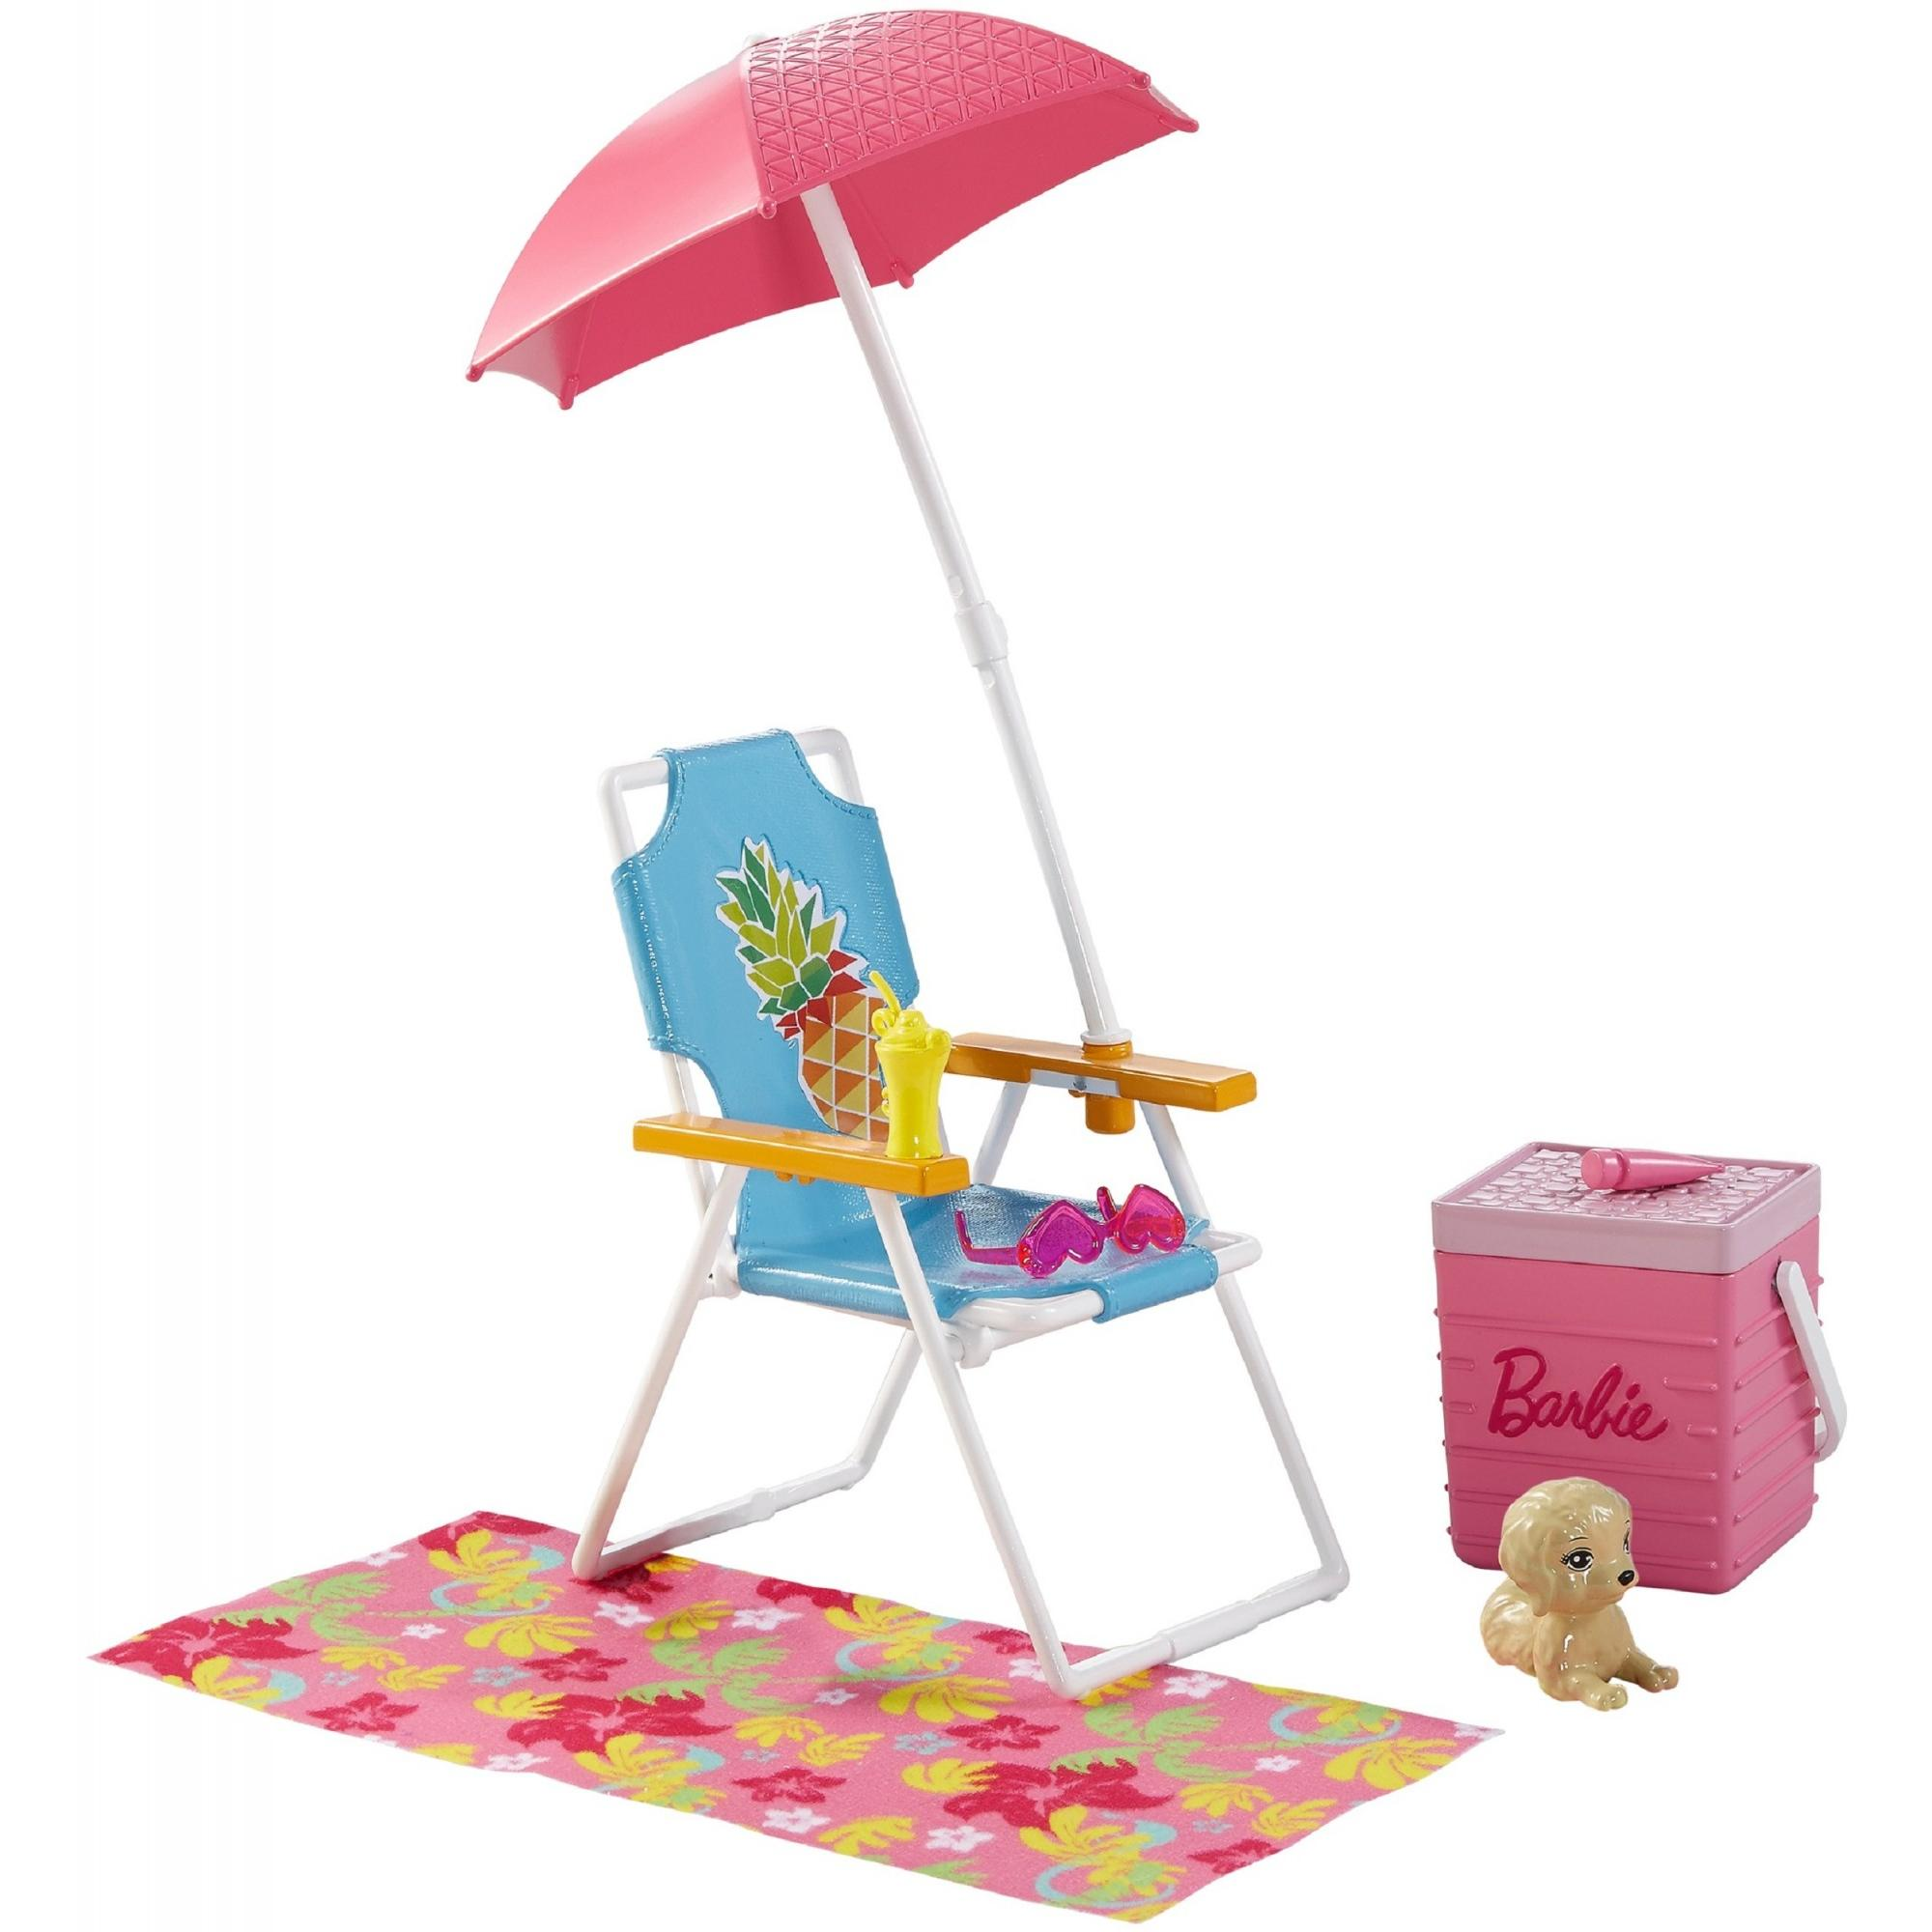 Barbie Picnic & Pet Set with Beach Chair, Umbrella & Cooler